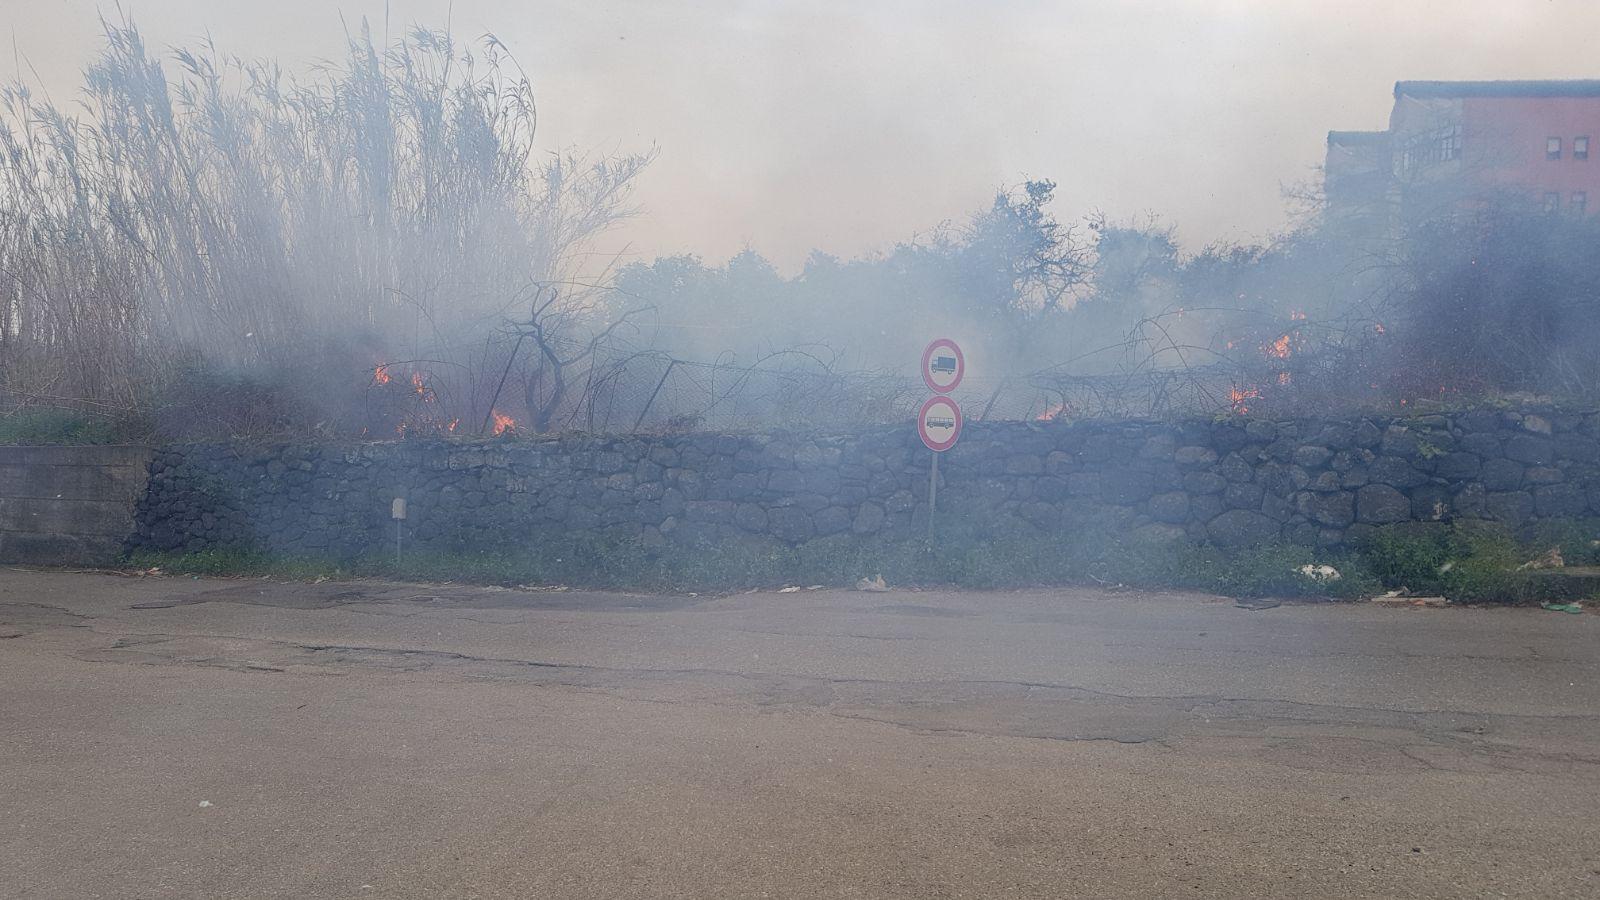 Riposto vasto incendio in via mario carbonaro intervento dei vigili del fuoco - Incidente giardini naxos oggi ...